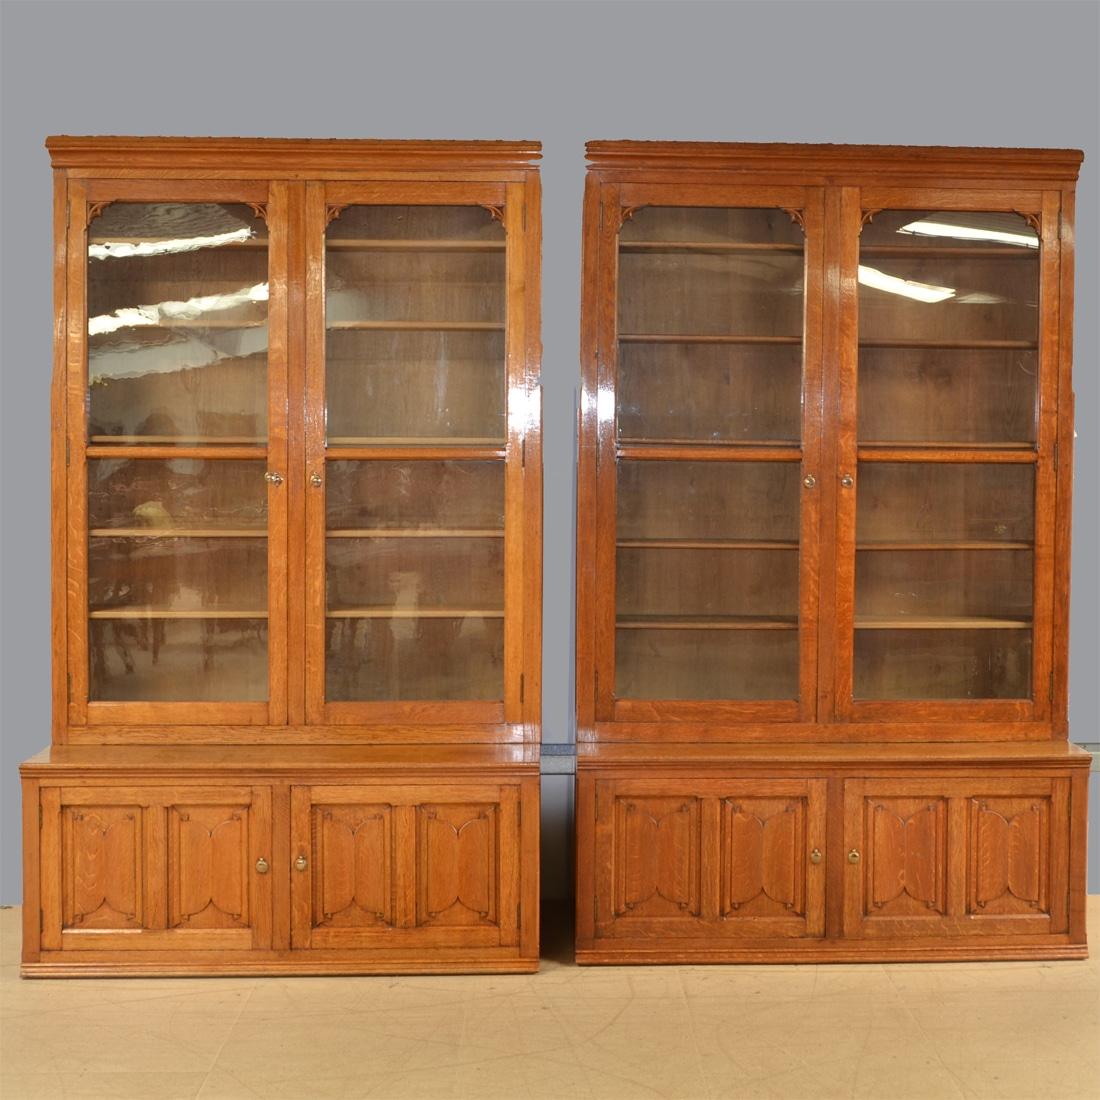 Furniture Restoration Near Me Uk: Huge Oak Victorian Pair Of Antique Library Bookcases